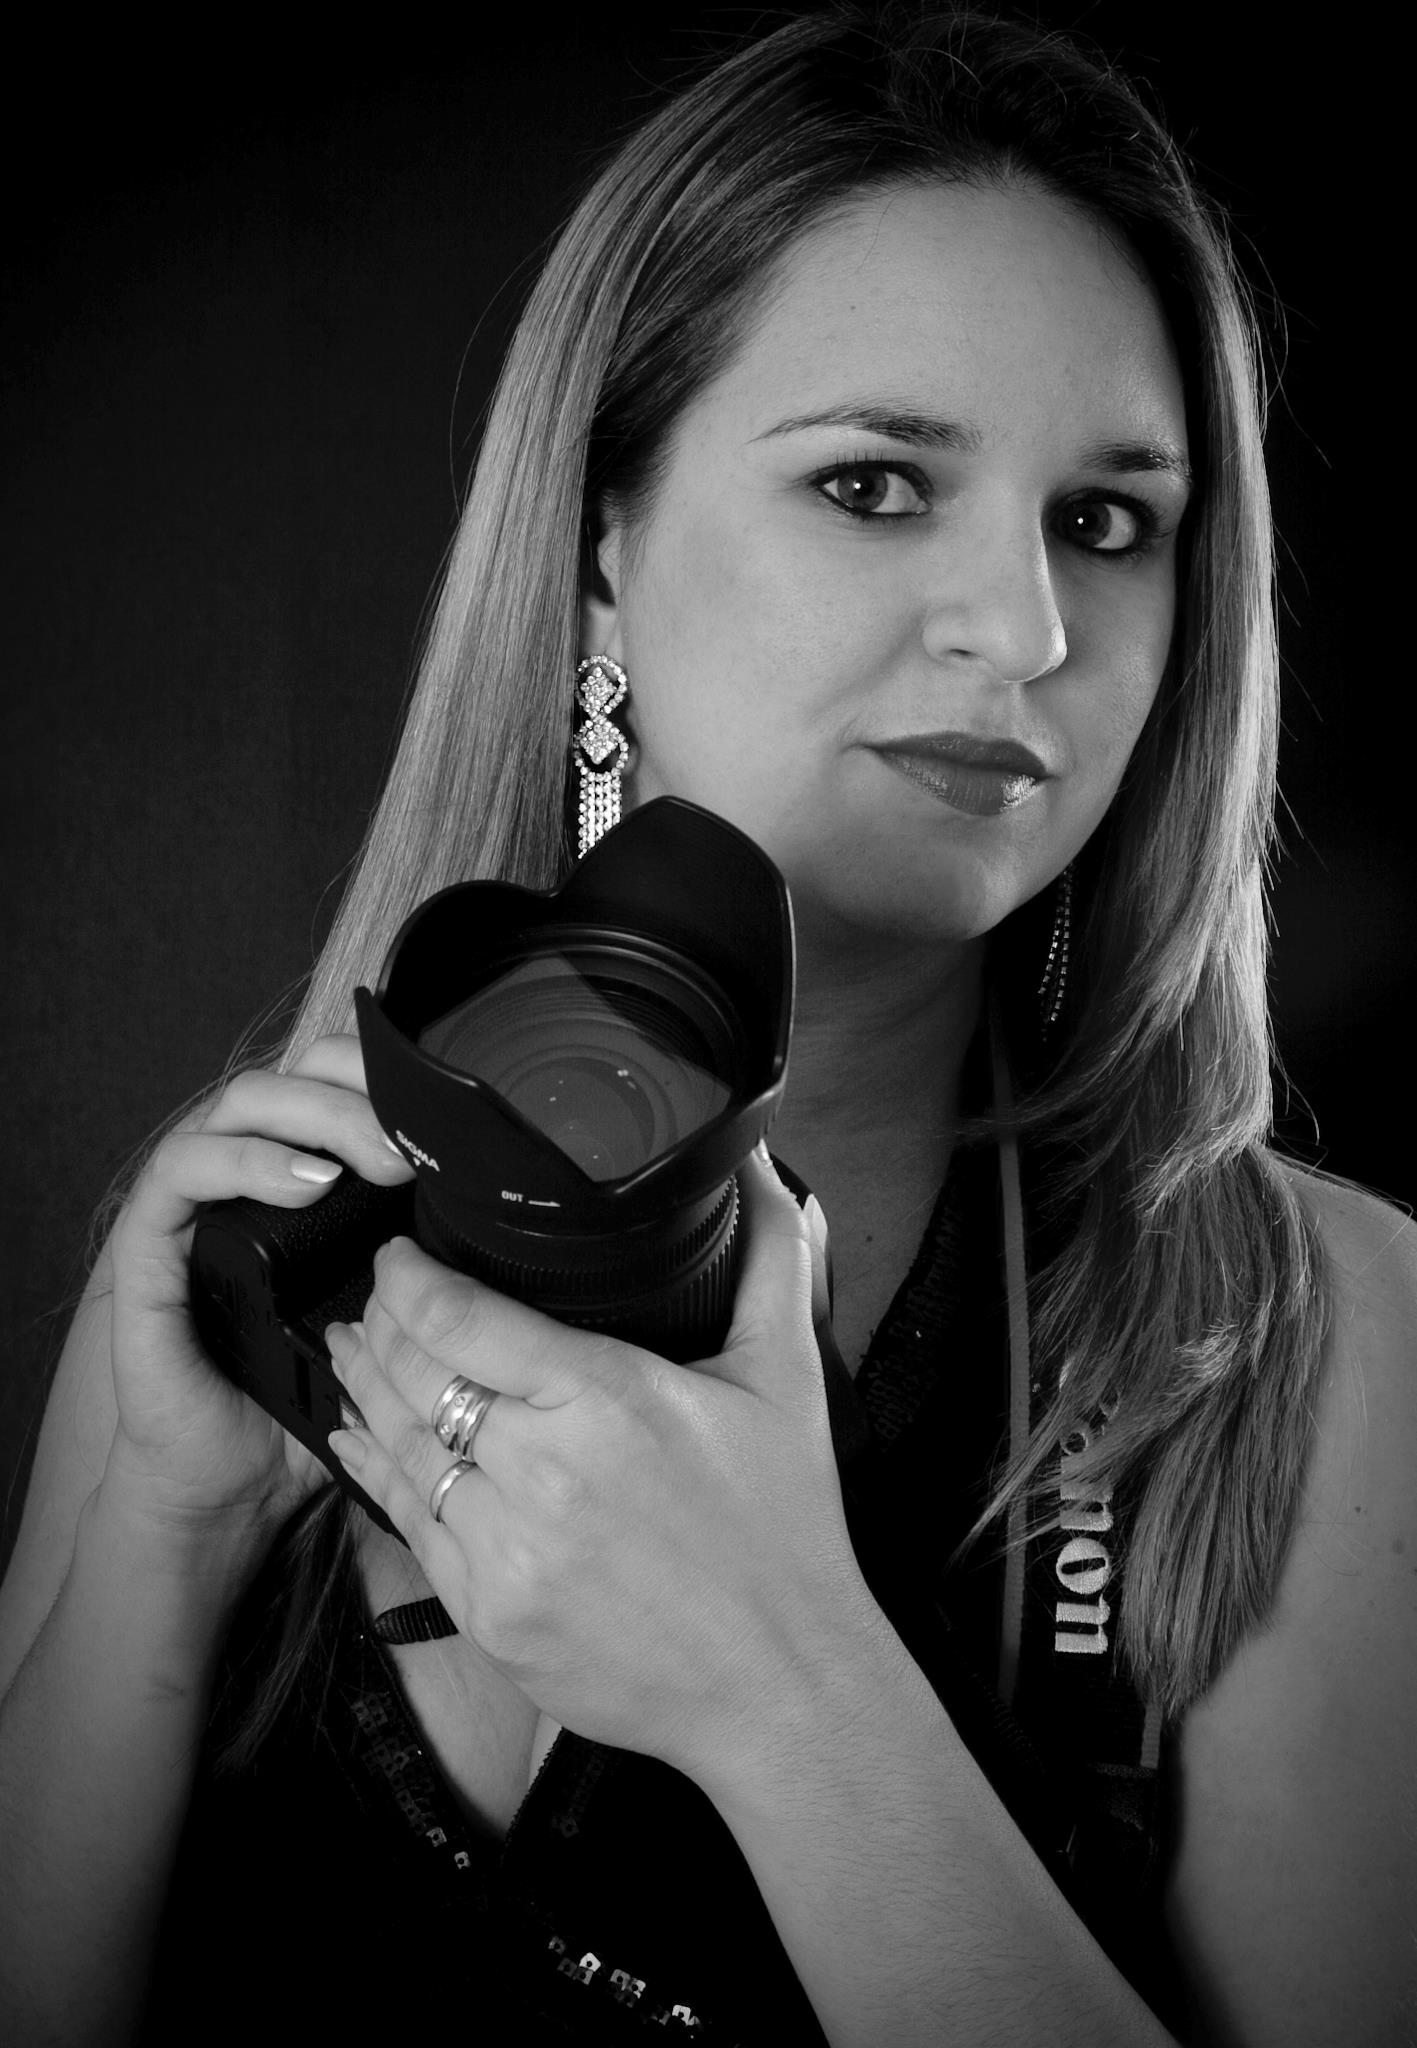 A fotógrafa Danielle Silveira